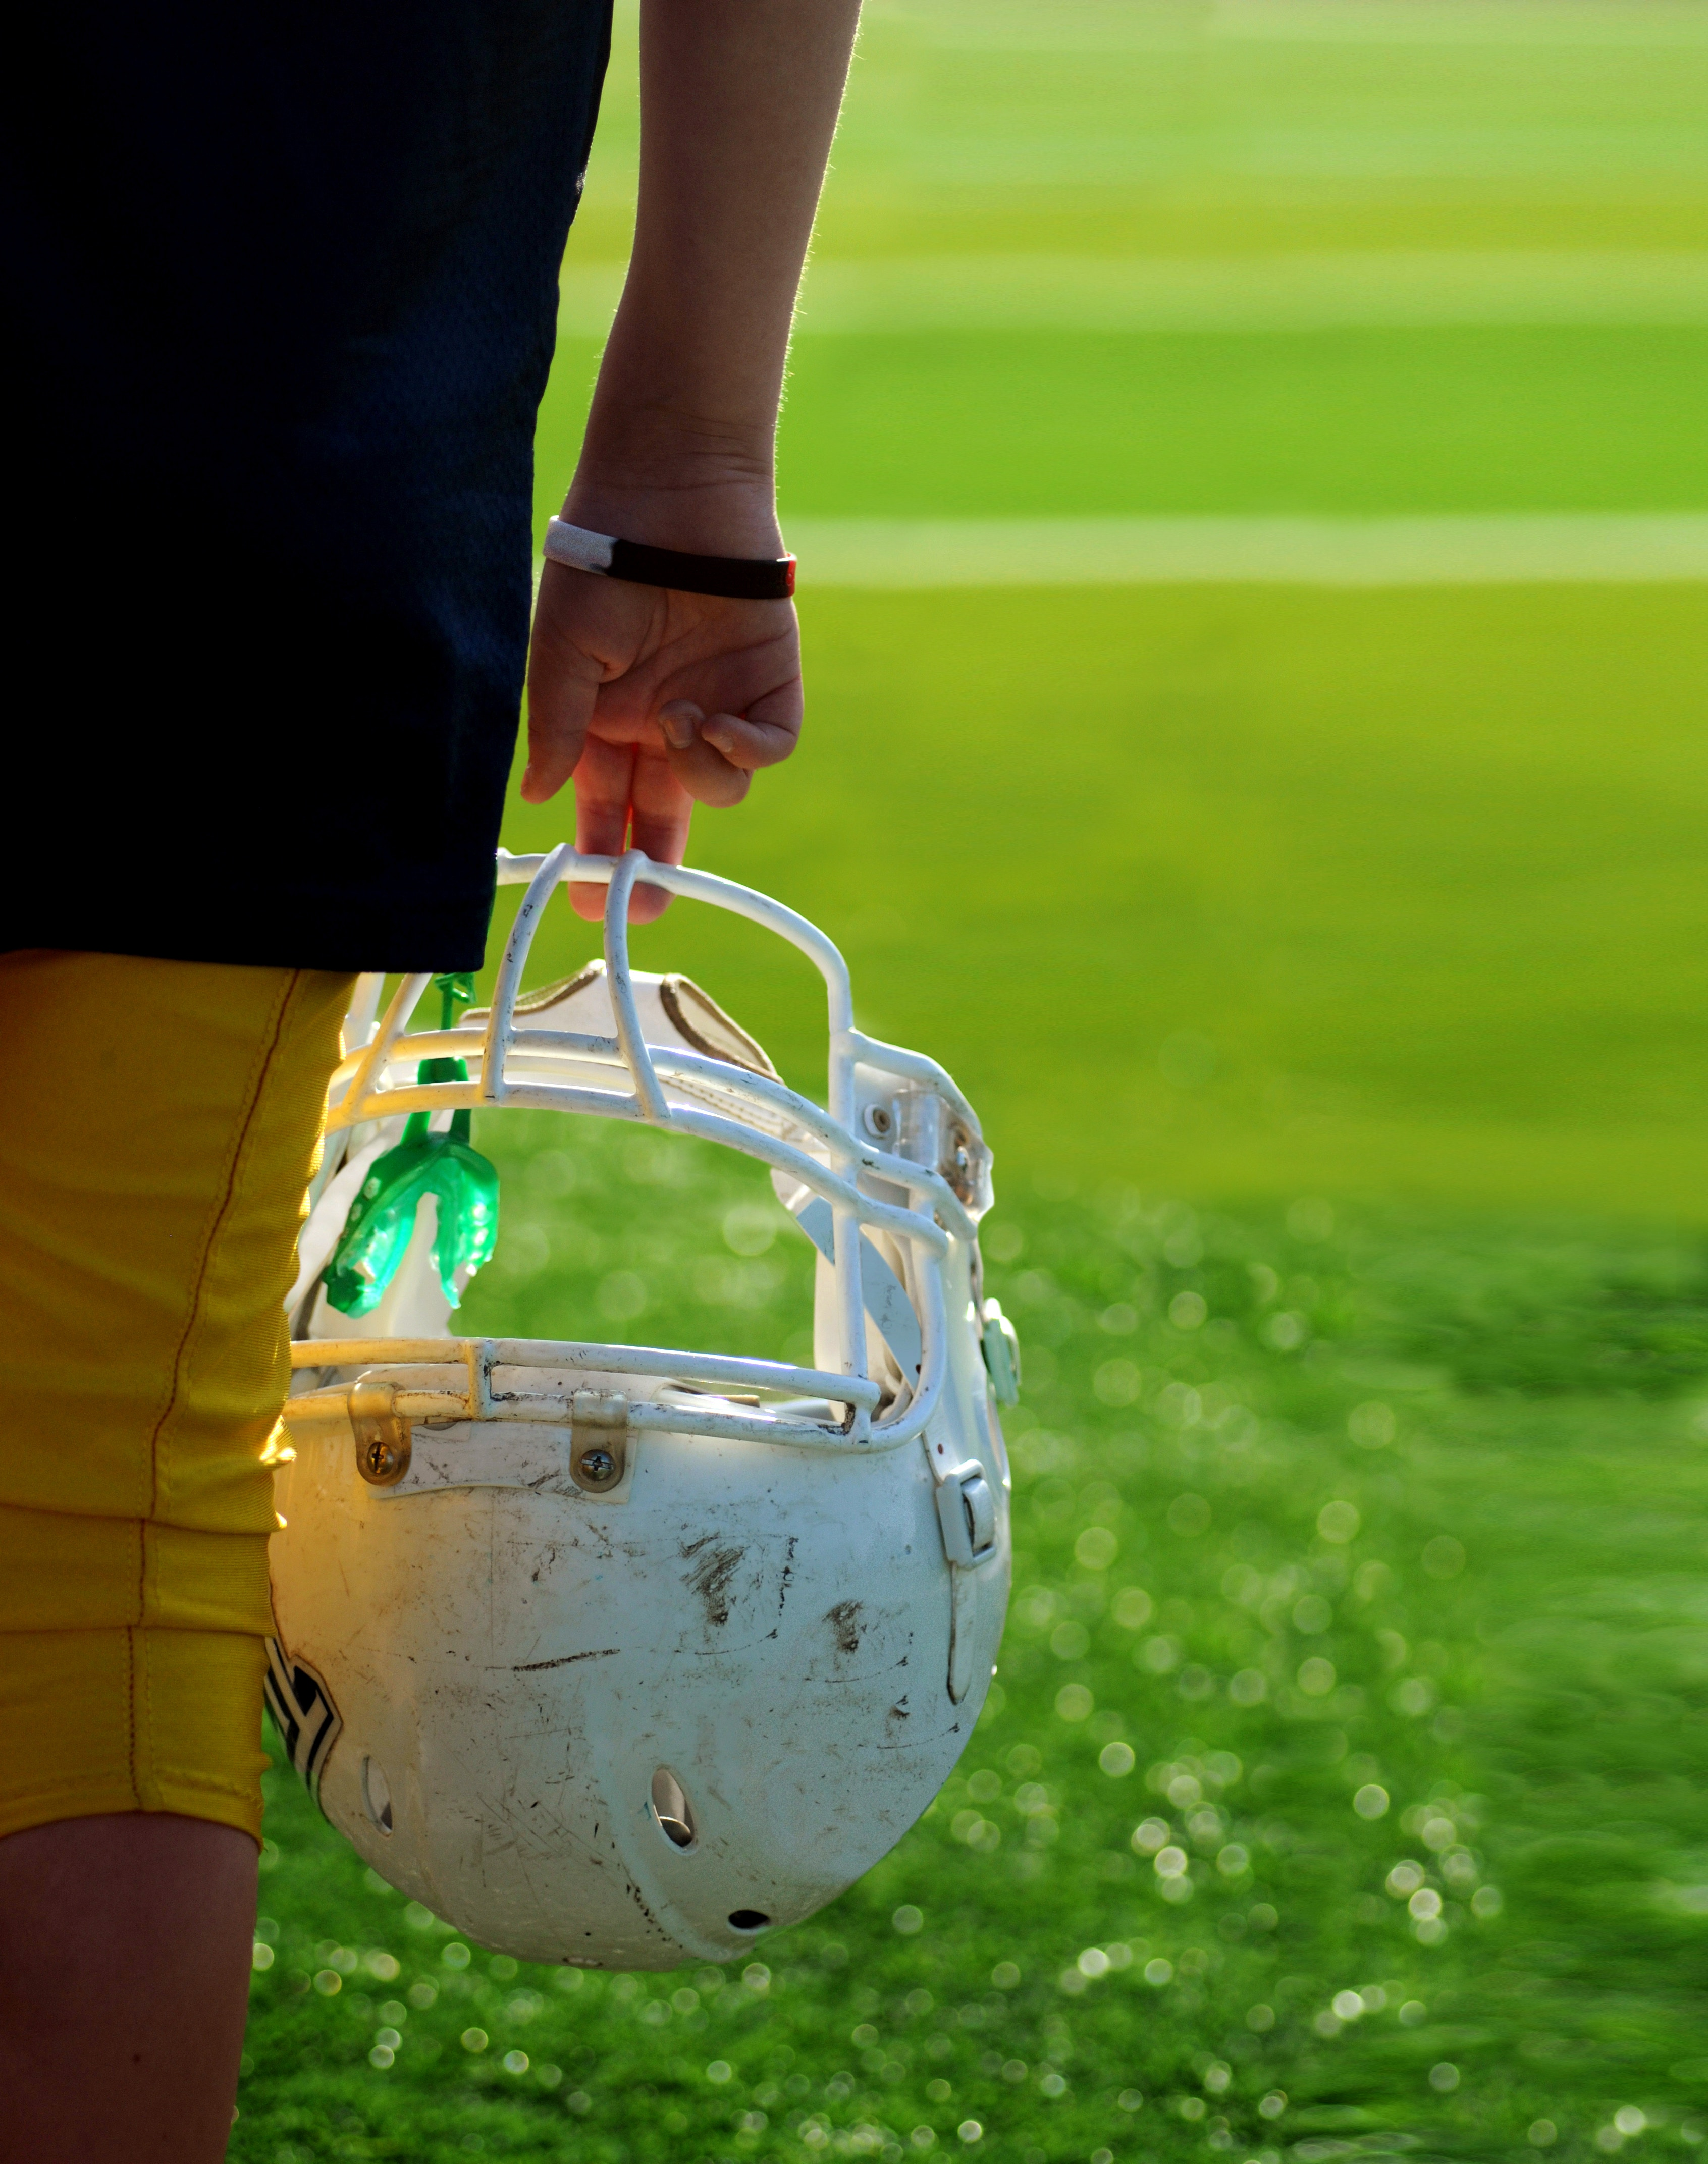 Choosing a Football Mouth Guard